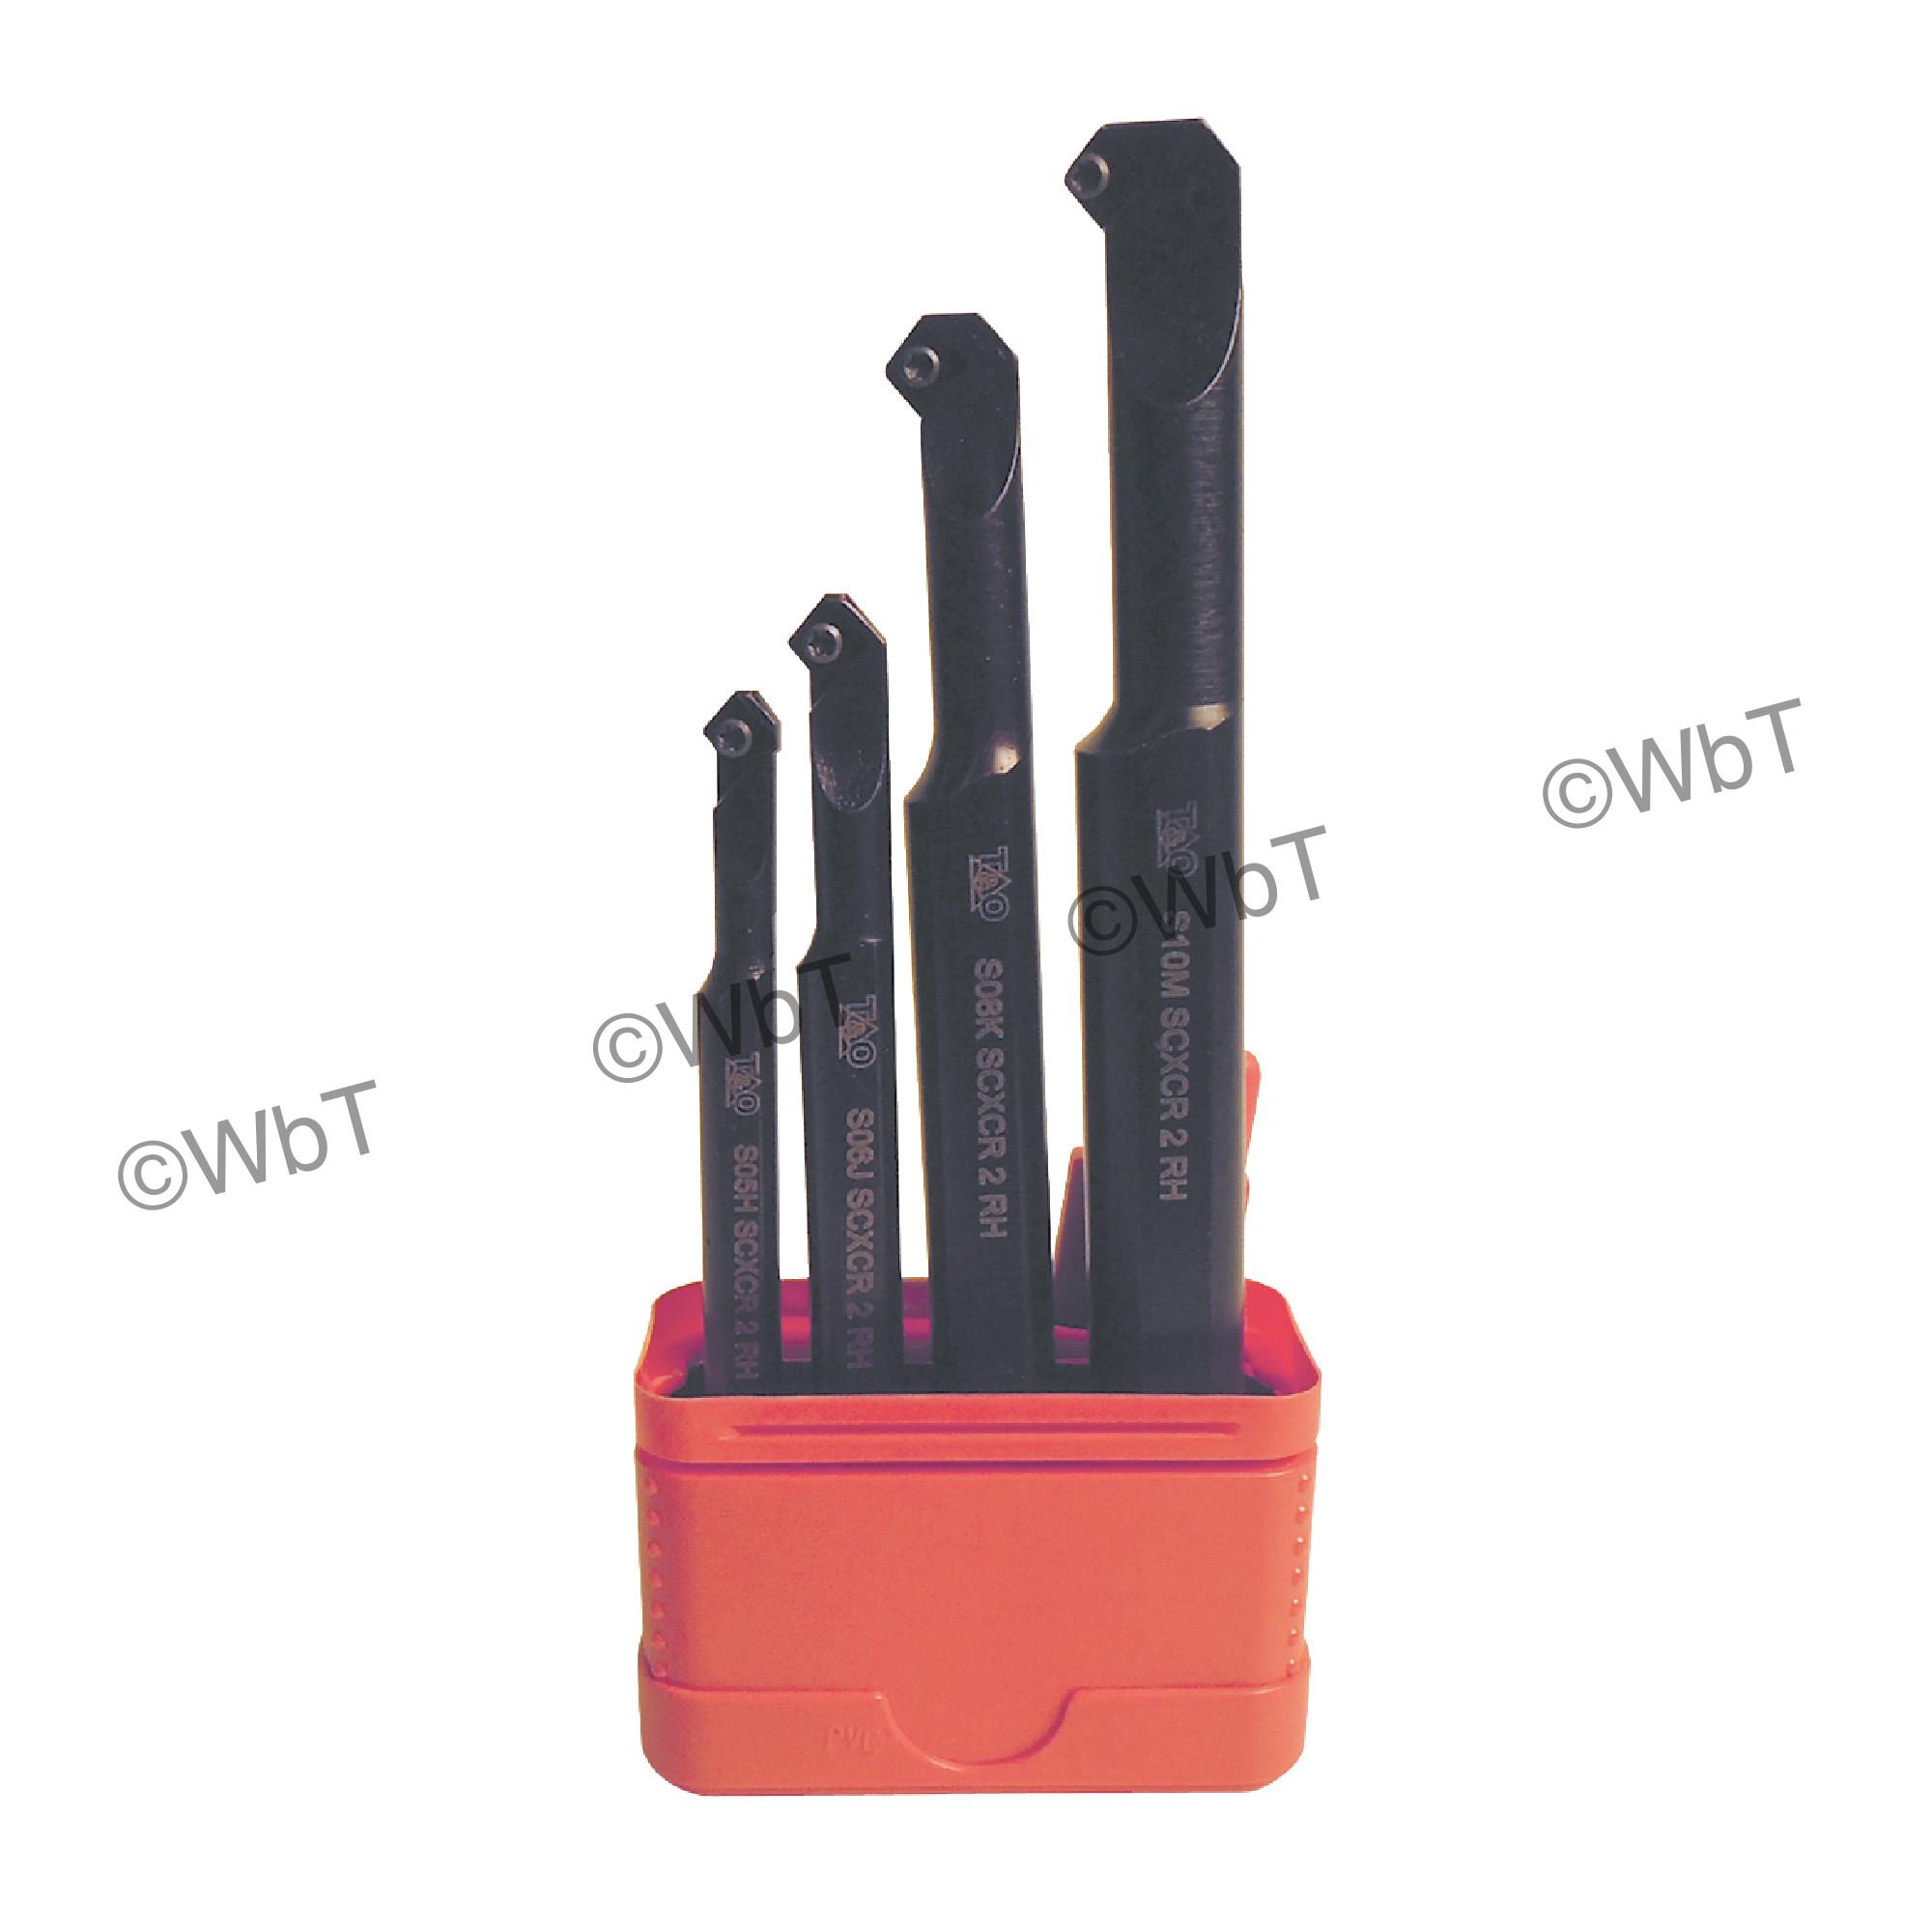 "T&O - S-SCXCR-2 SET-A Steel / Boring Bar Set (5/16"", 3/8"", 1/2"", & 5/8"") 100° CCMT2(1.5)_ Inserts / Right Hand"